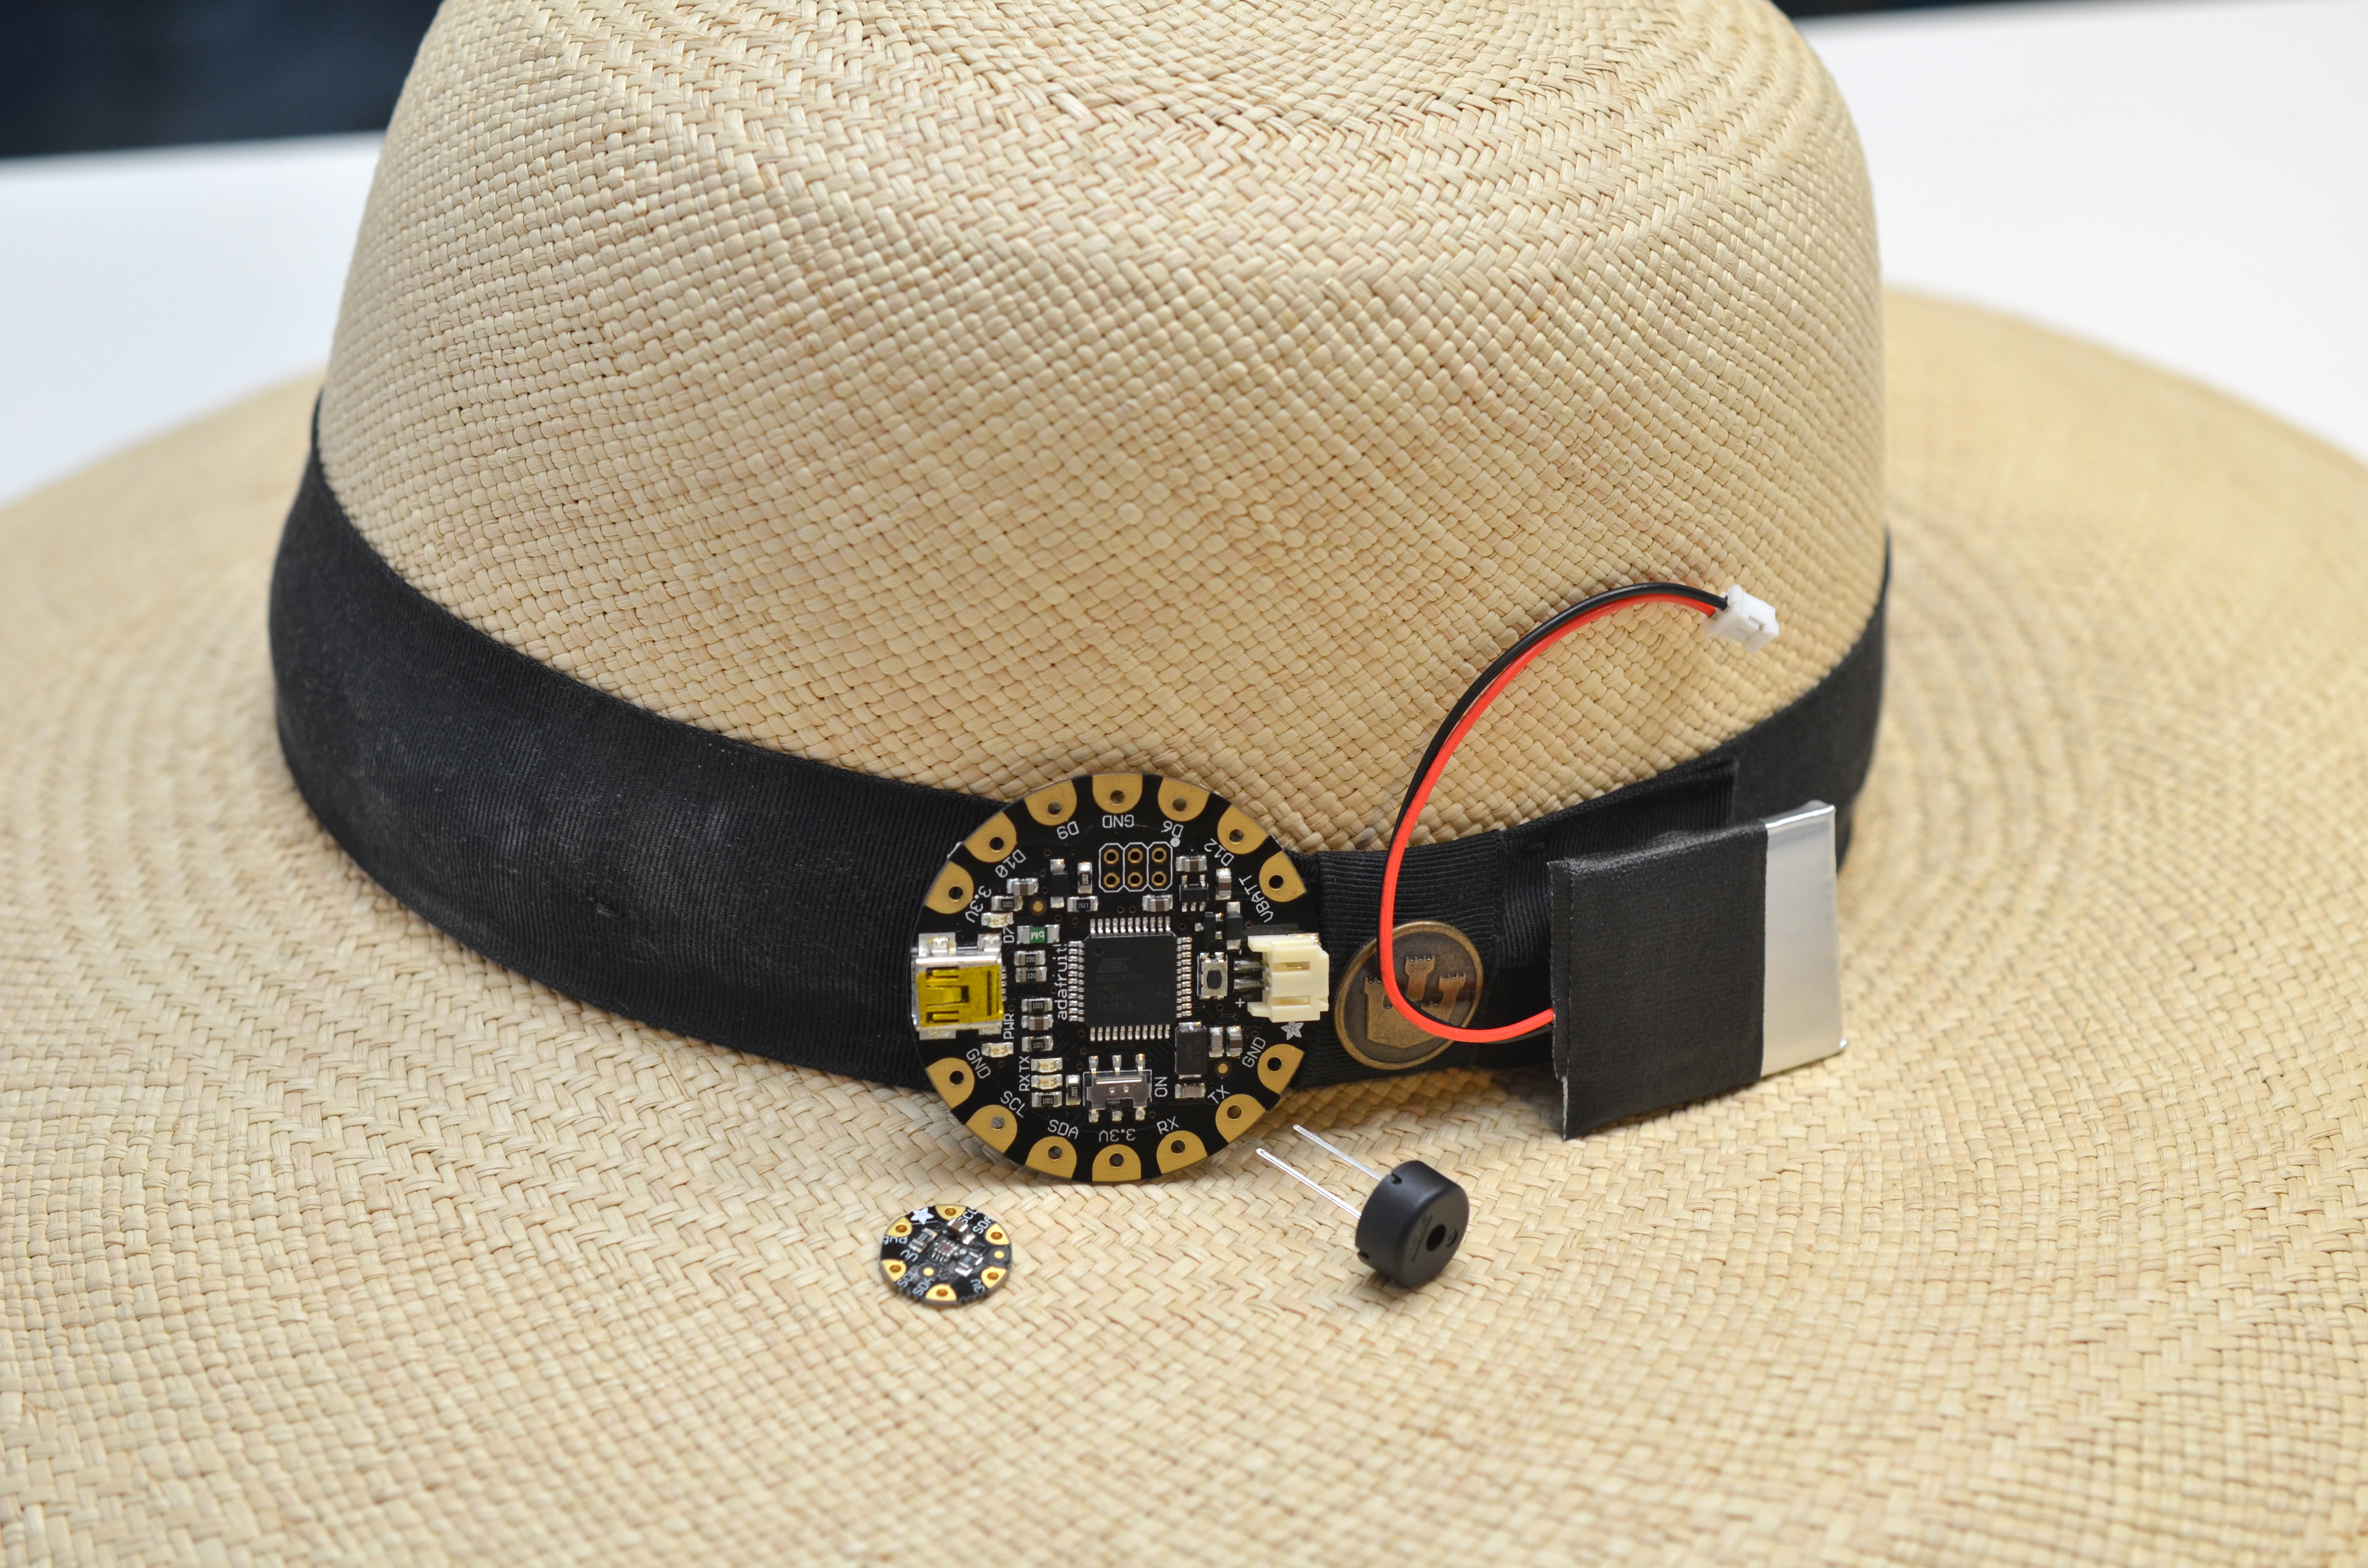 light_sunscreen-reminder-hat-01.jpg